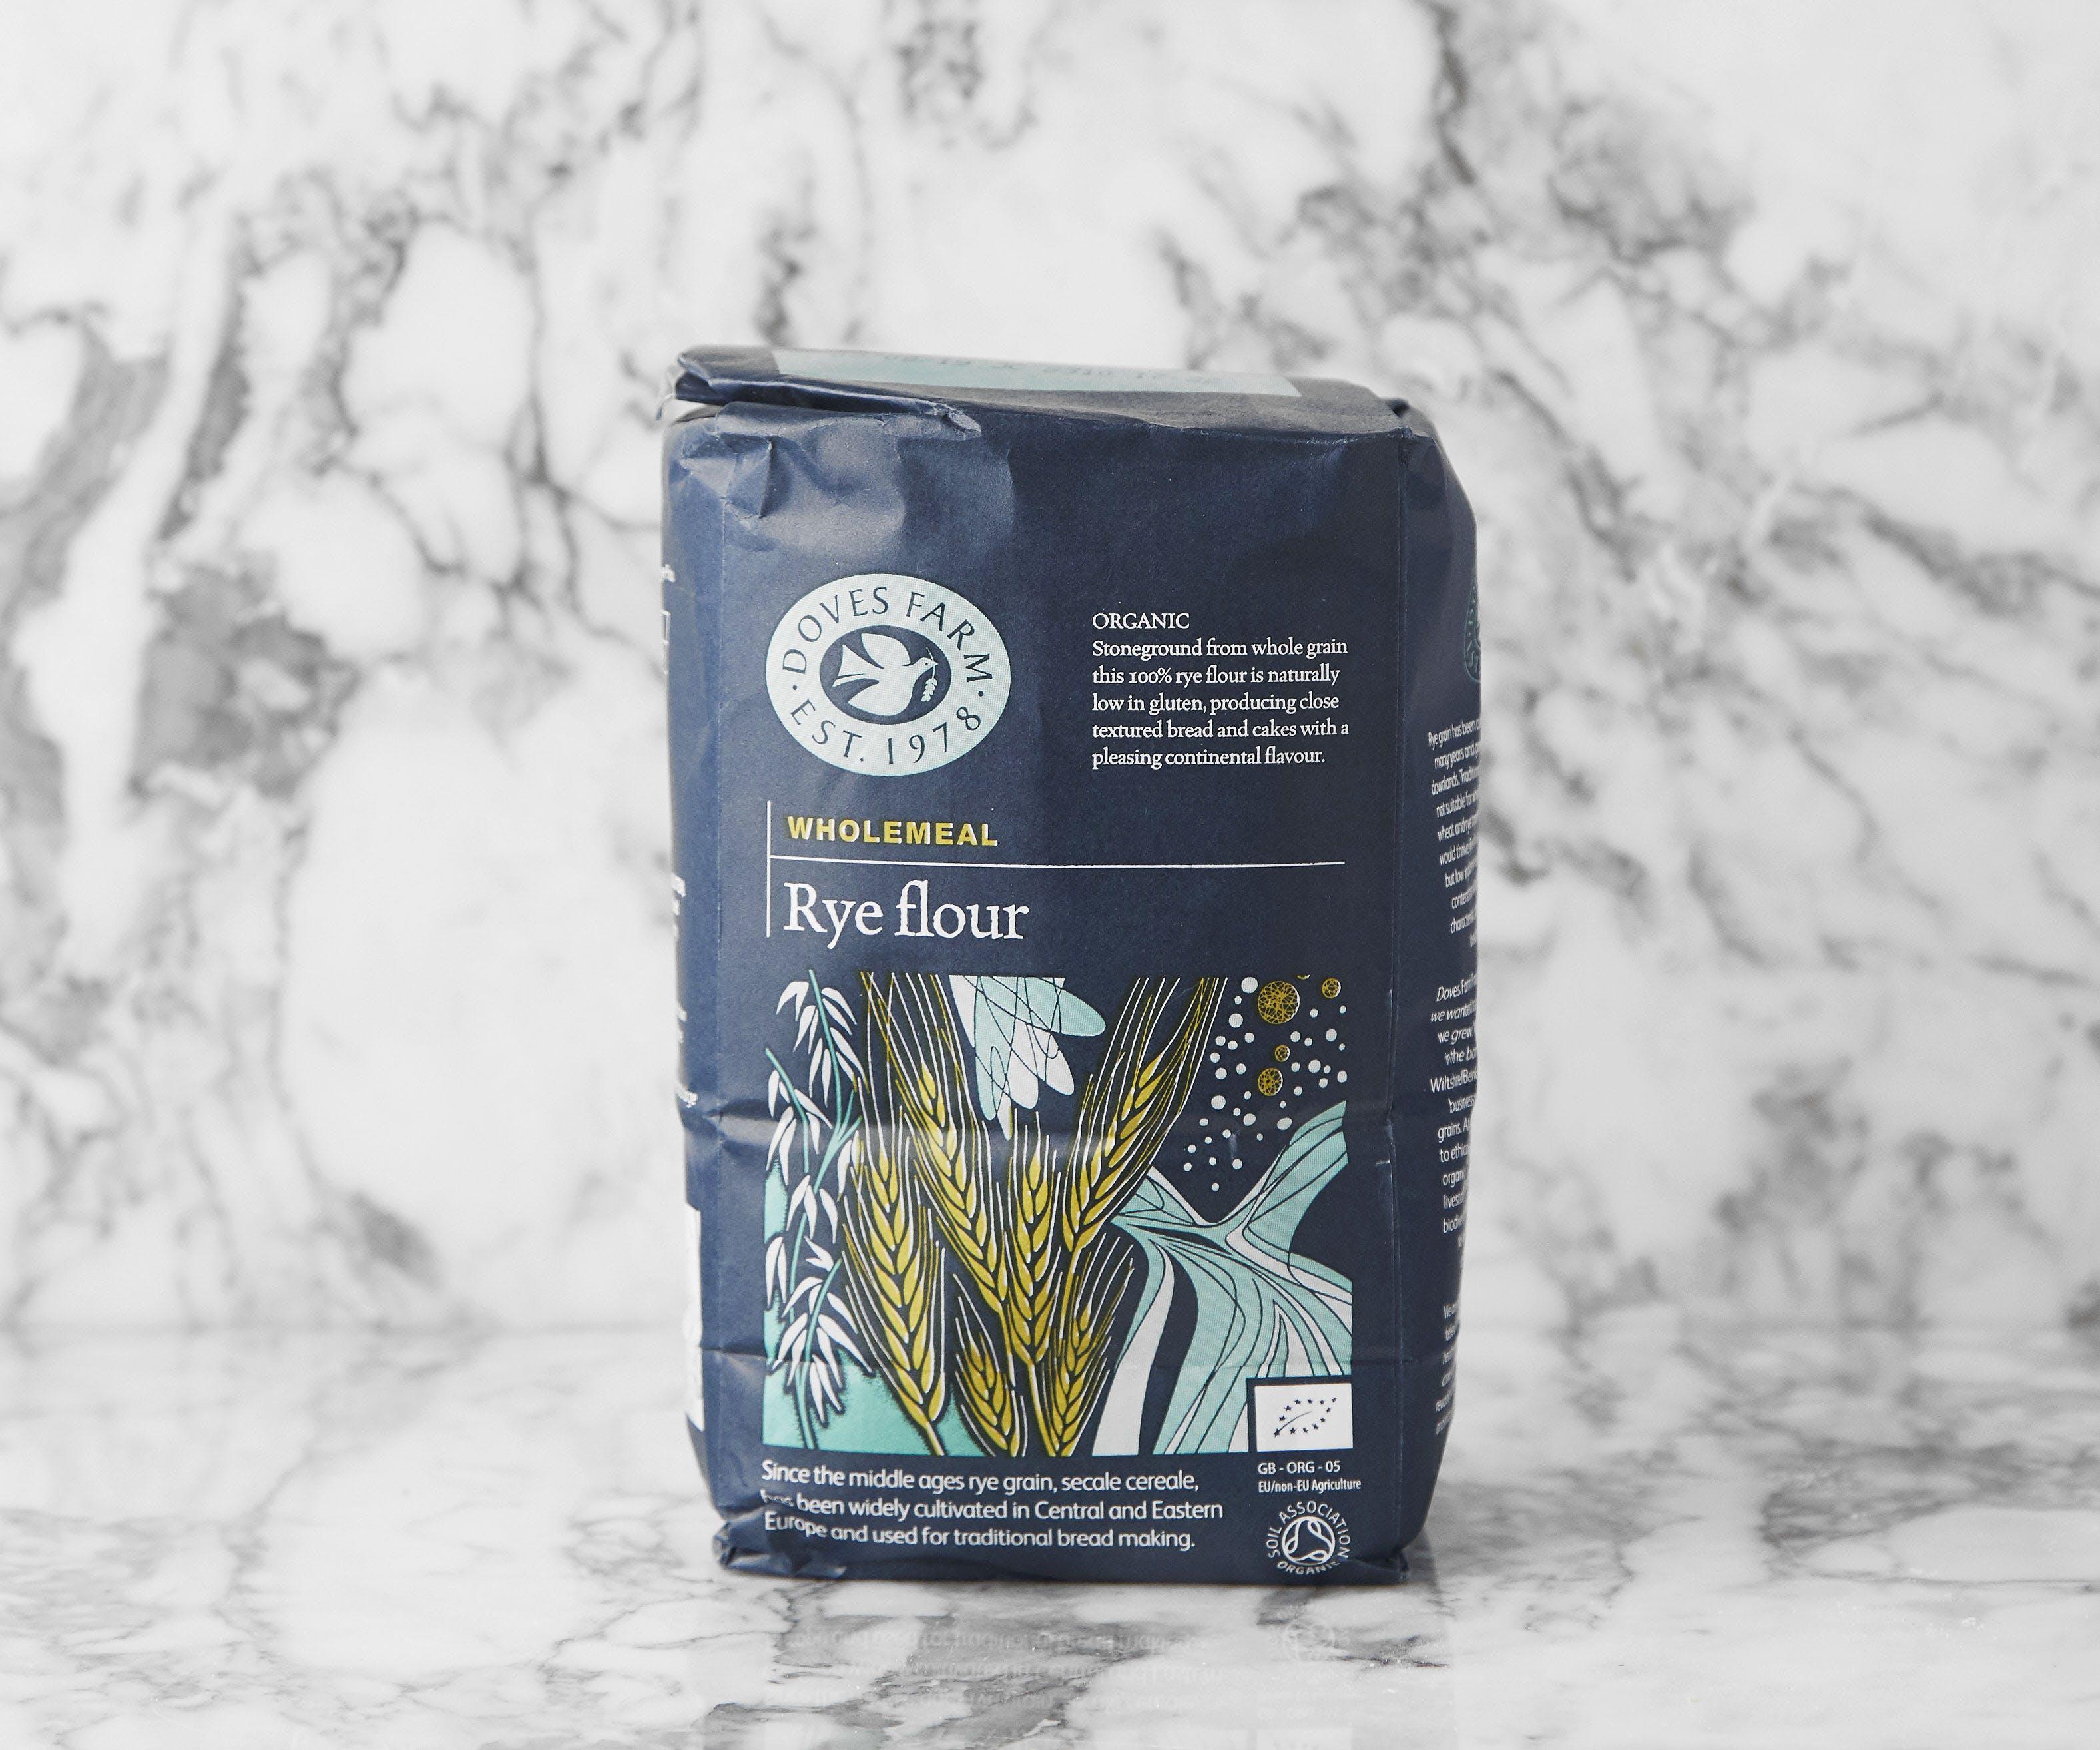 Organic Wholemeal Rye Flour